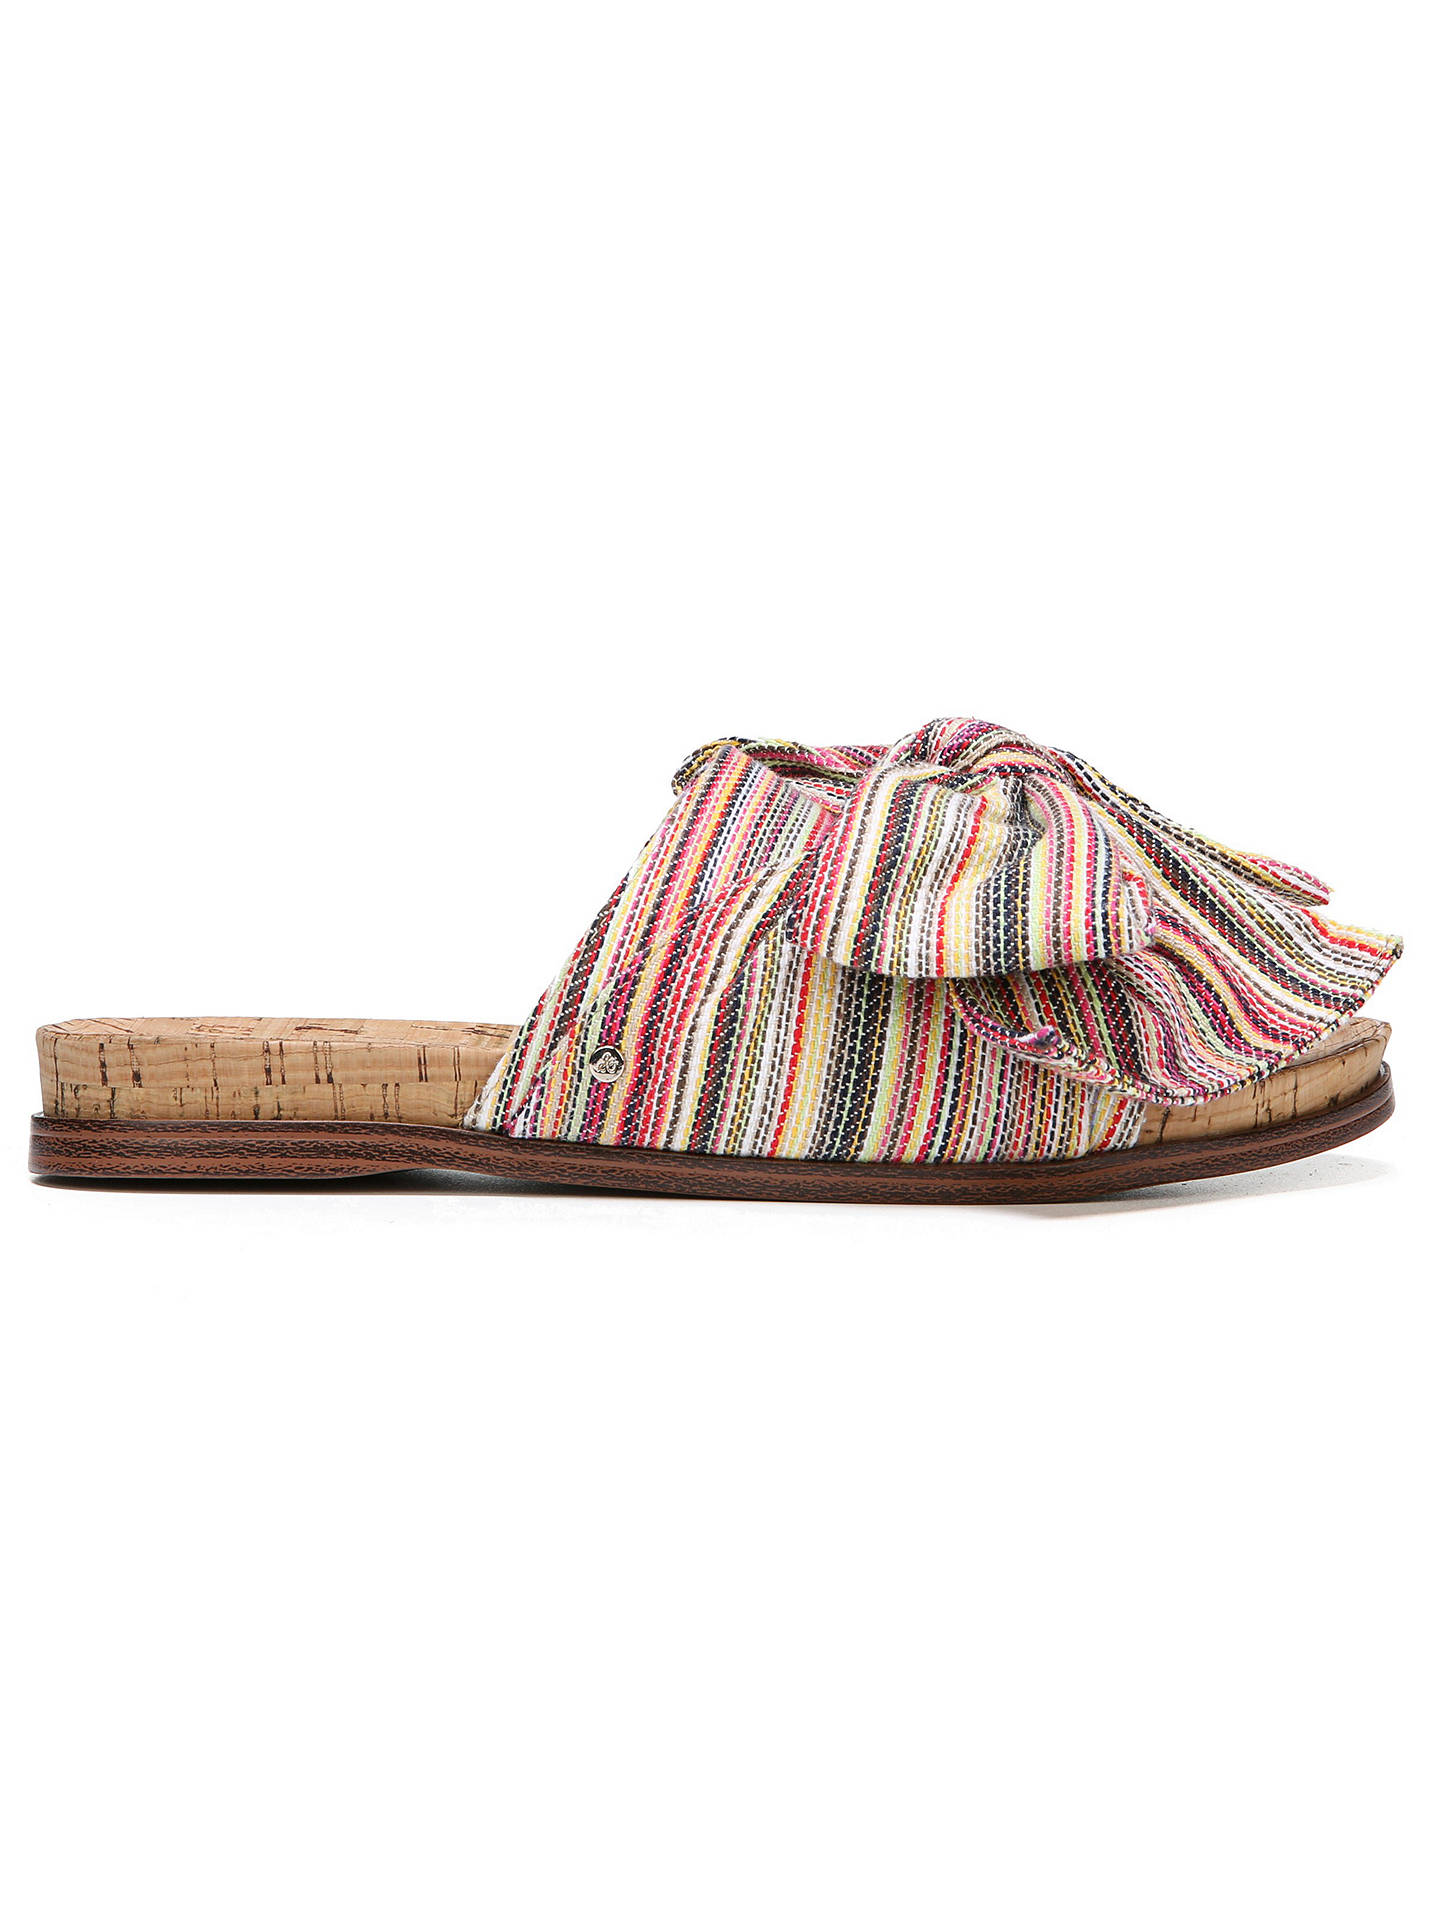 c37e4e2c6464a ... BuySam Edelman Henna Bow Trimmed Mule Sandals